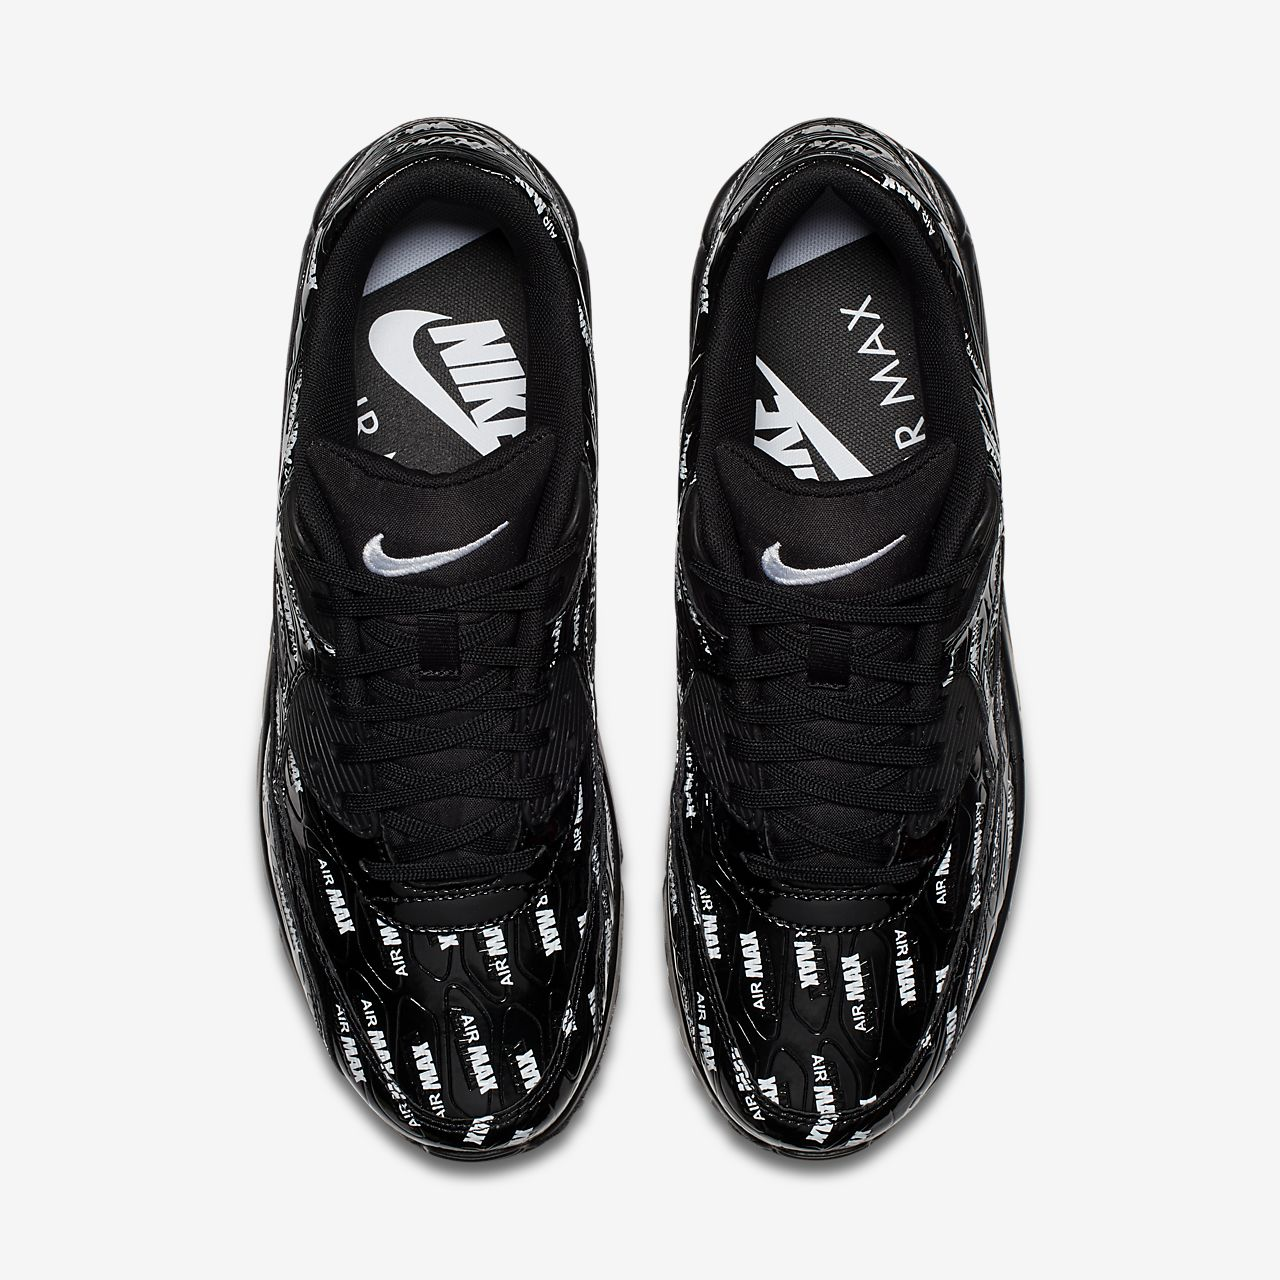 separation shoes e1c03 eb1fd ... Chaussure Nike Air Max 90 Premium pour Homme